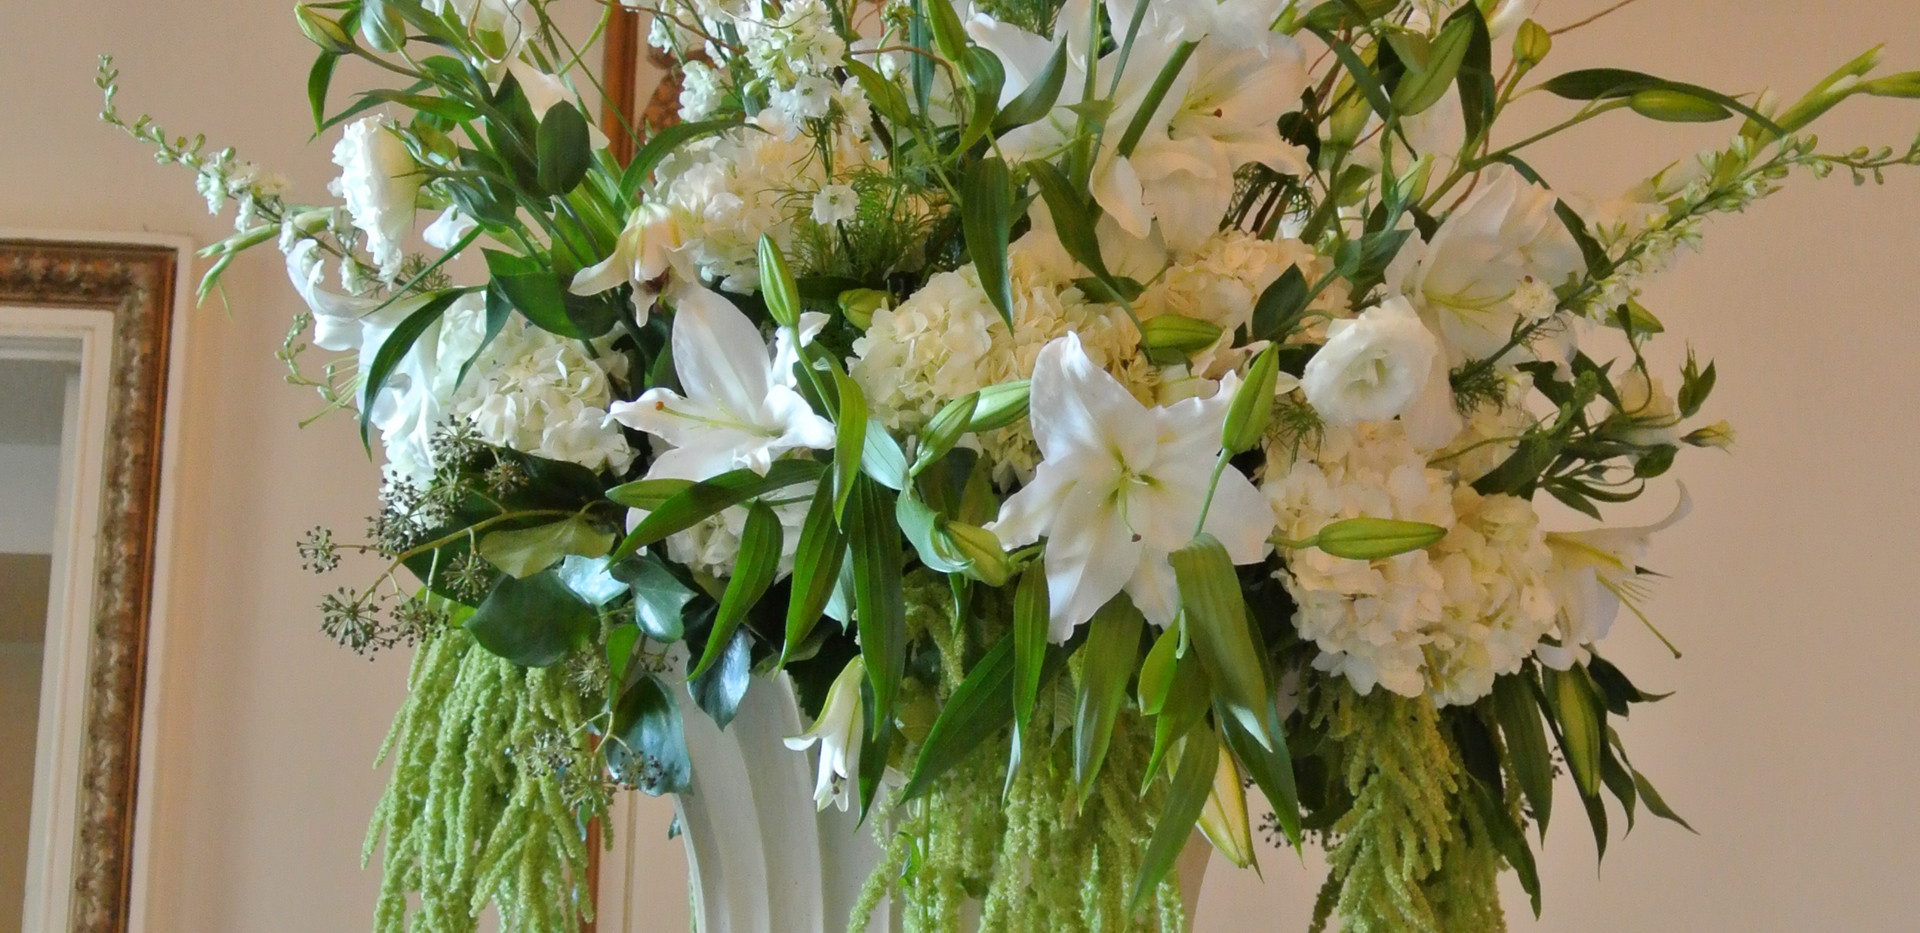 urn arrangement in whites ,cremes, greens on pedestal.JPG